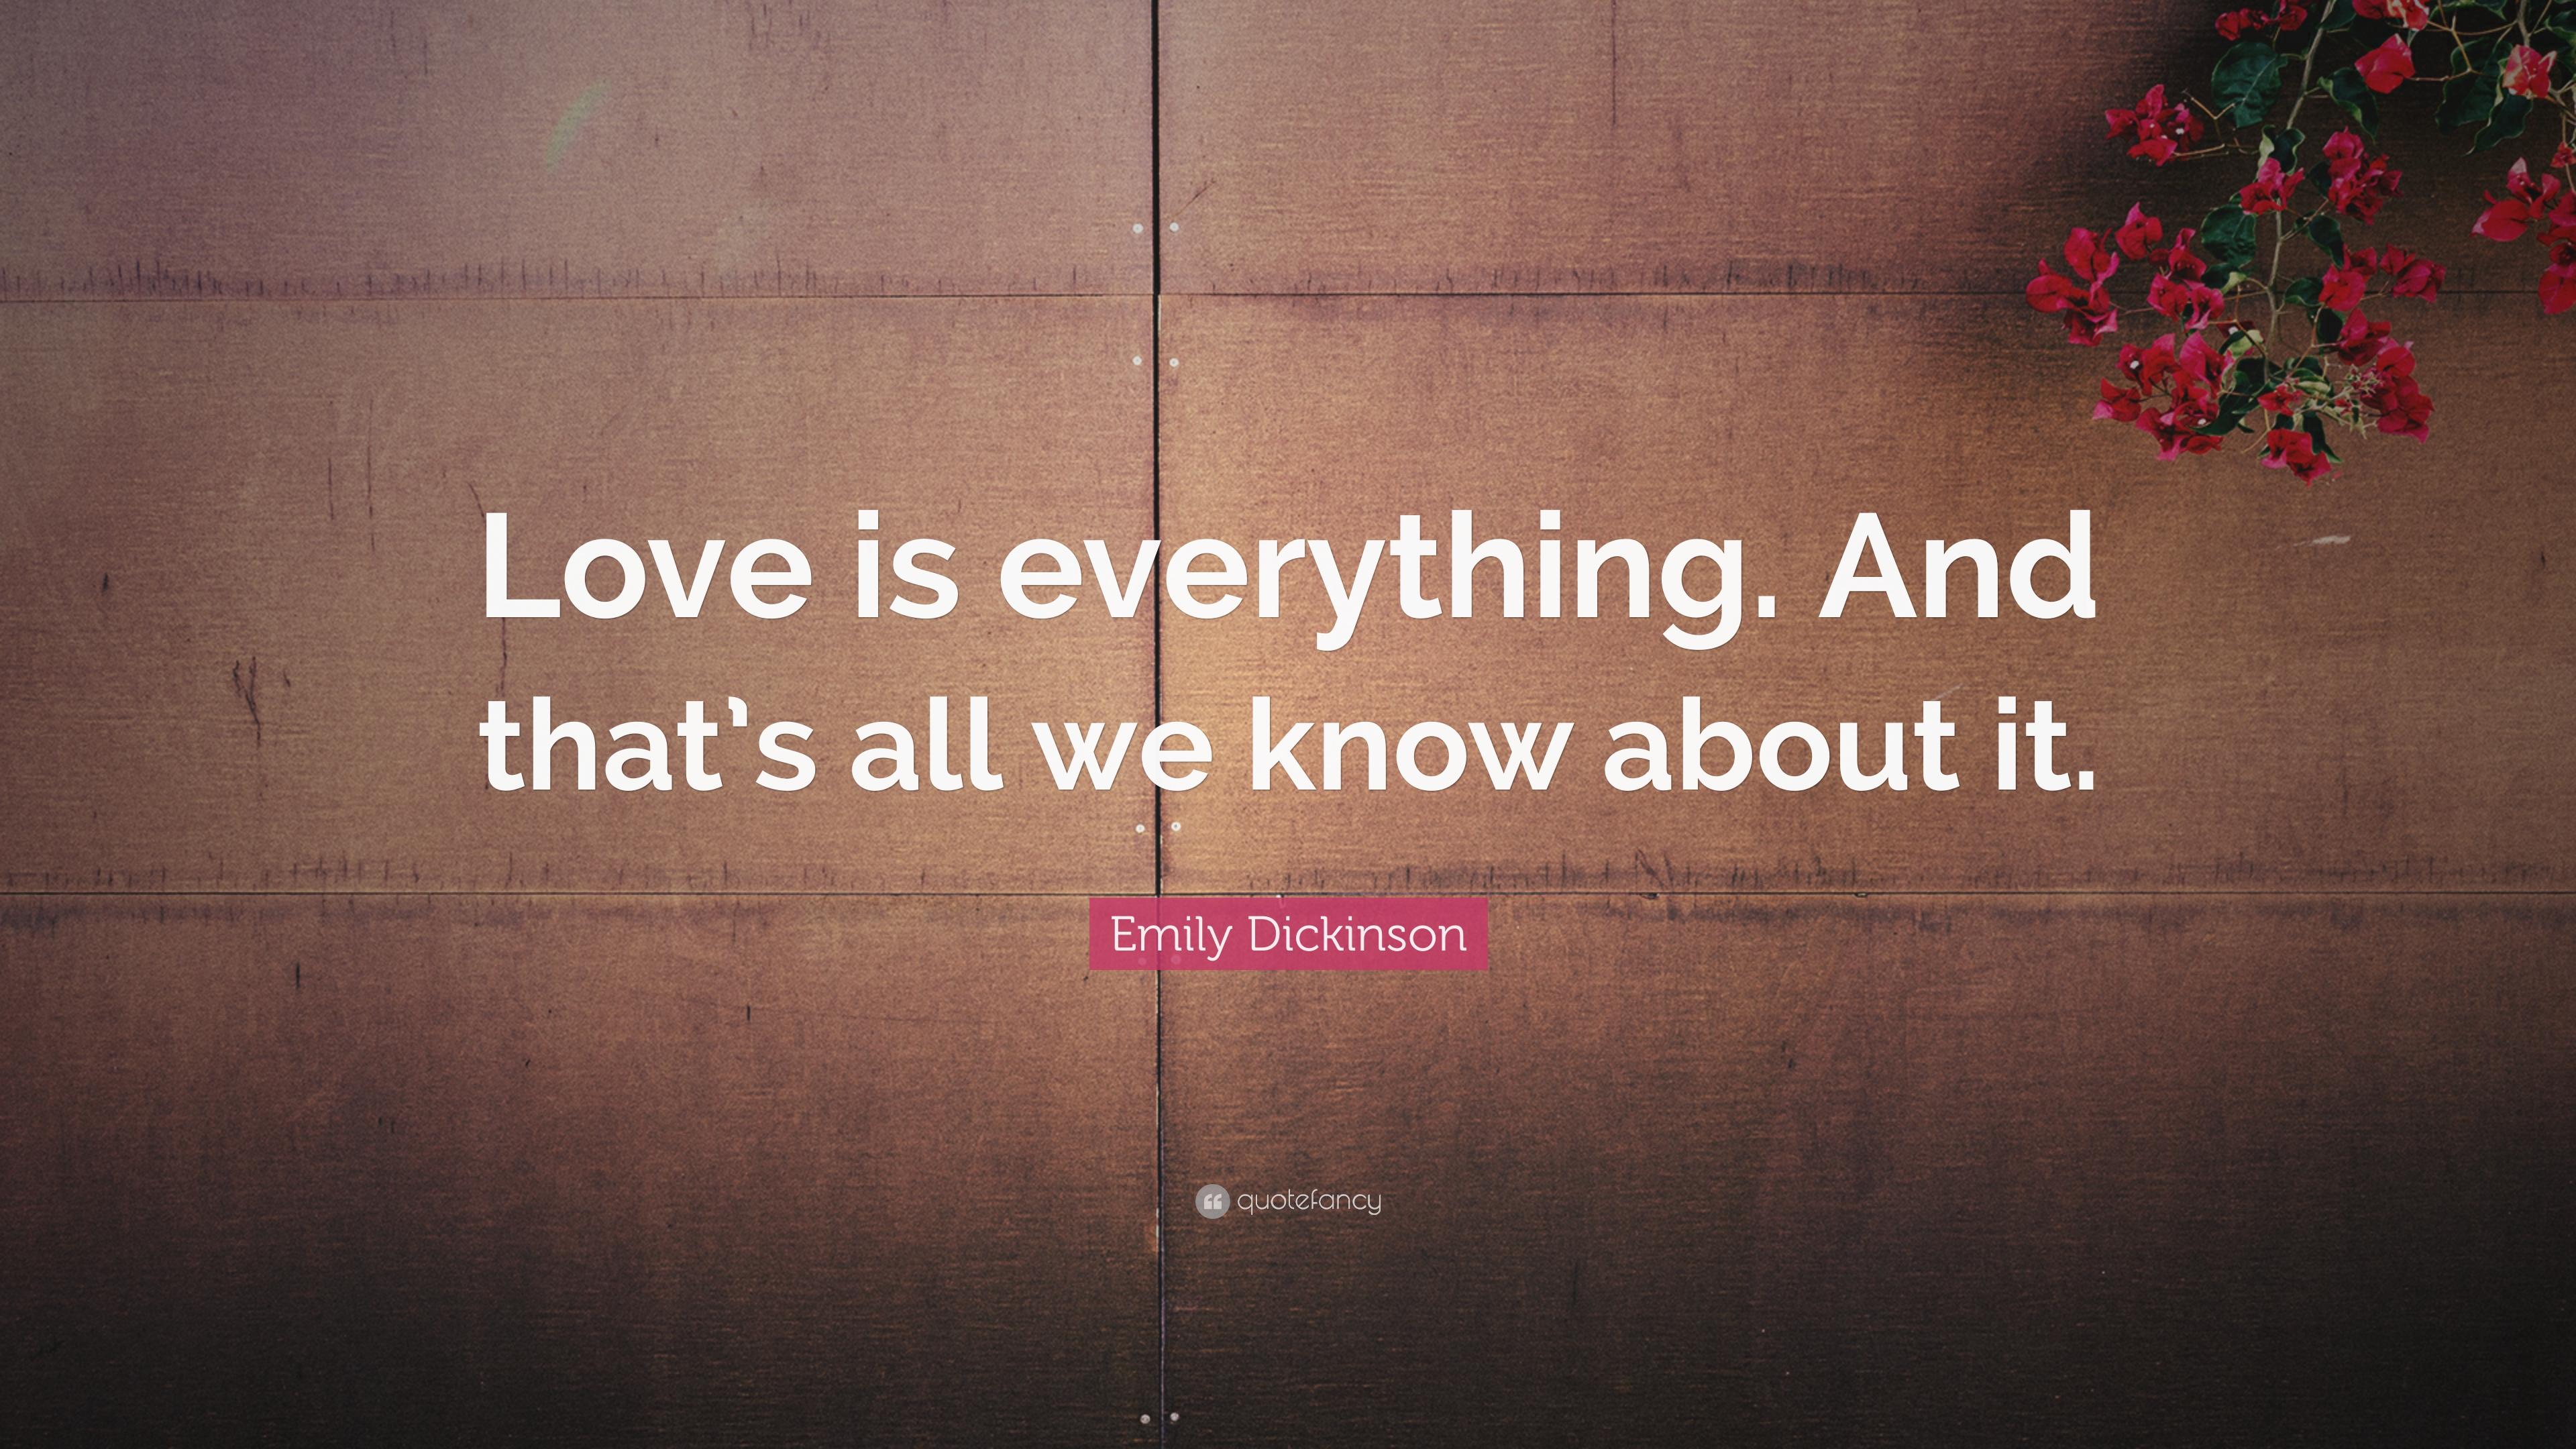 Emily Dickinson Love Quotes Pinterest thumbnail